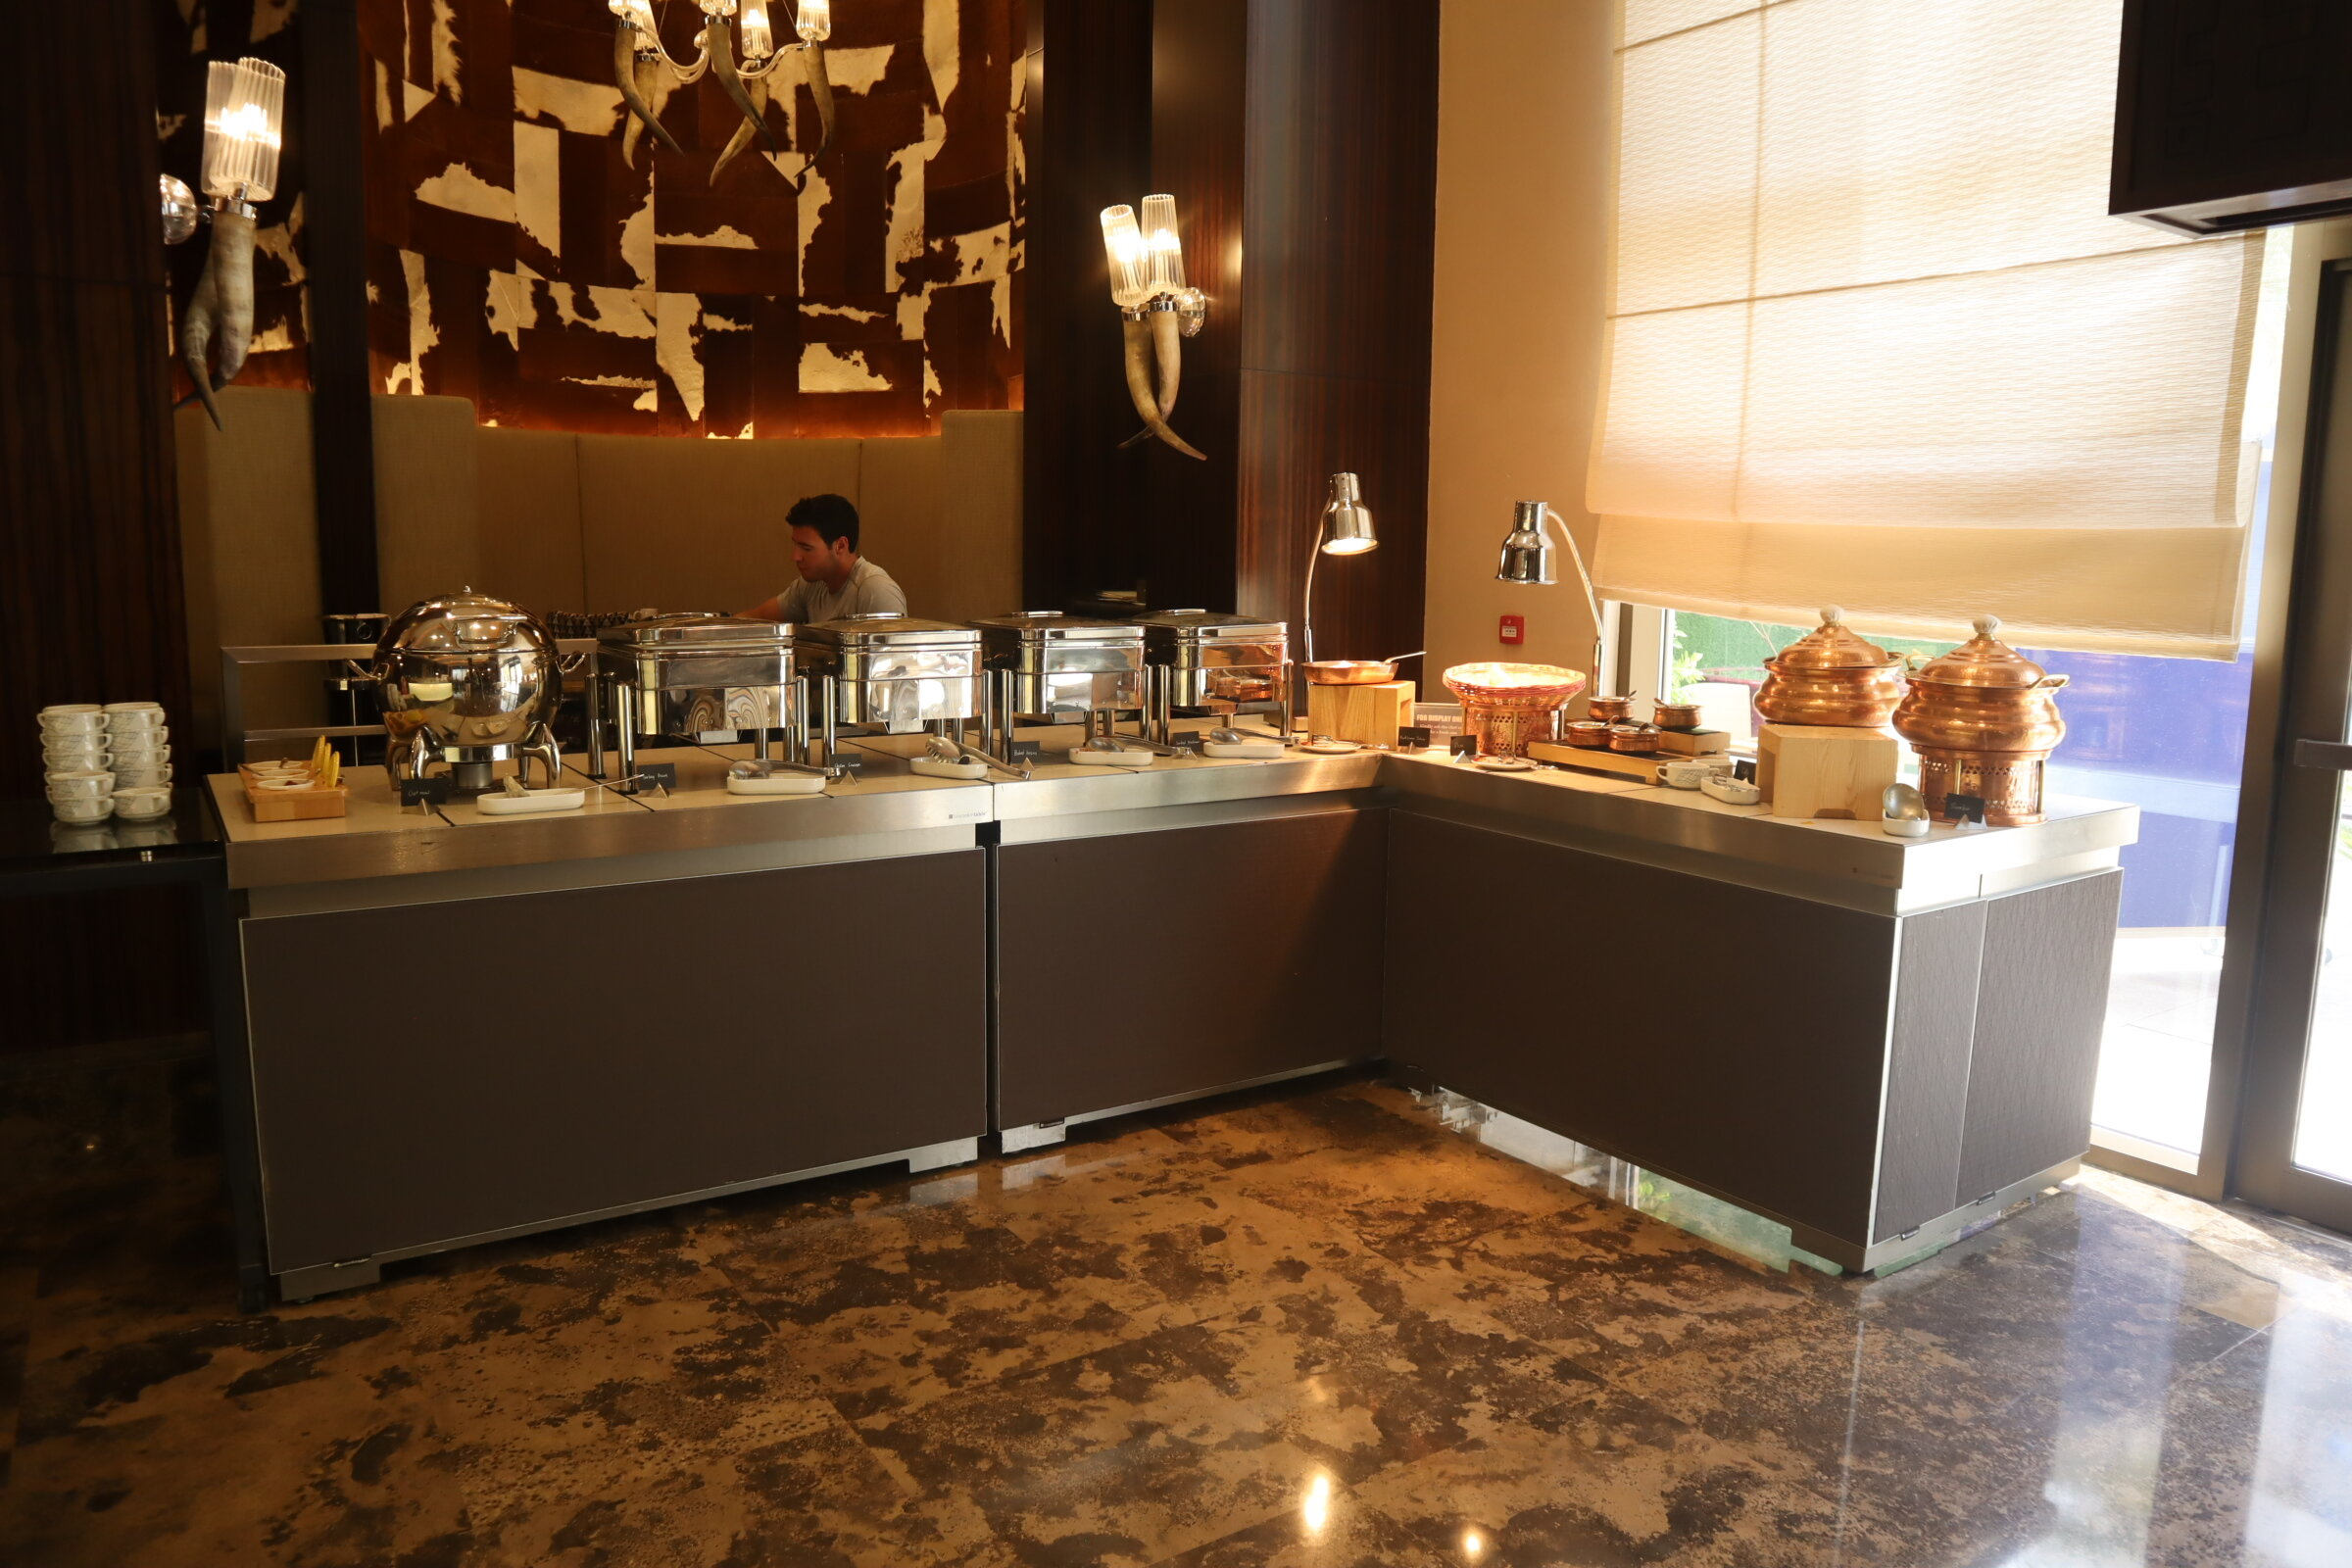 Sheraton Oman – Asado restaurant breakfast